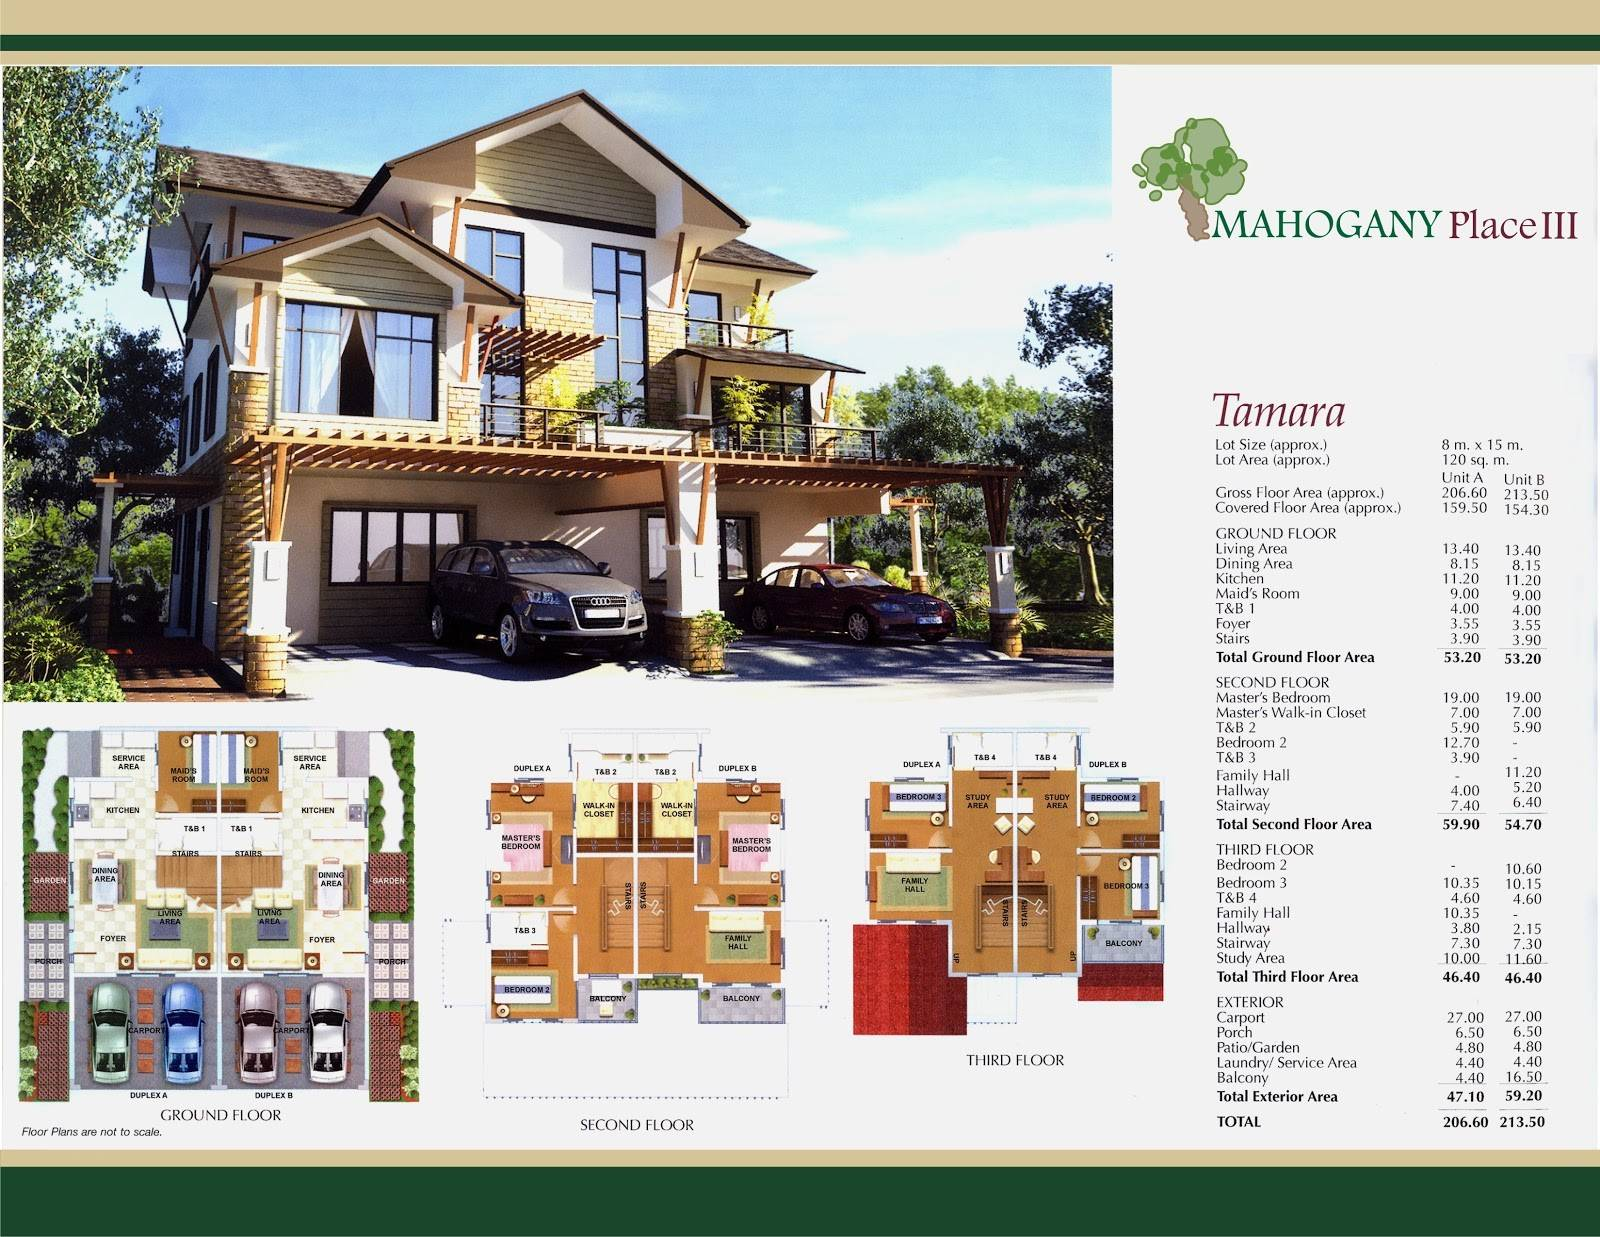 Philippines Bungalow Design Joy Studio Best